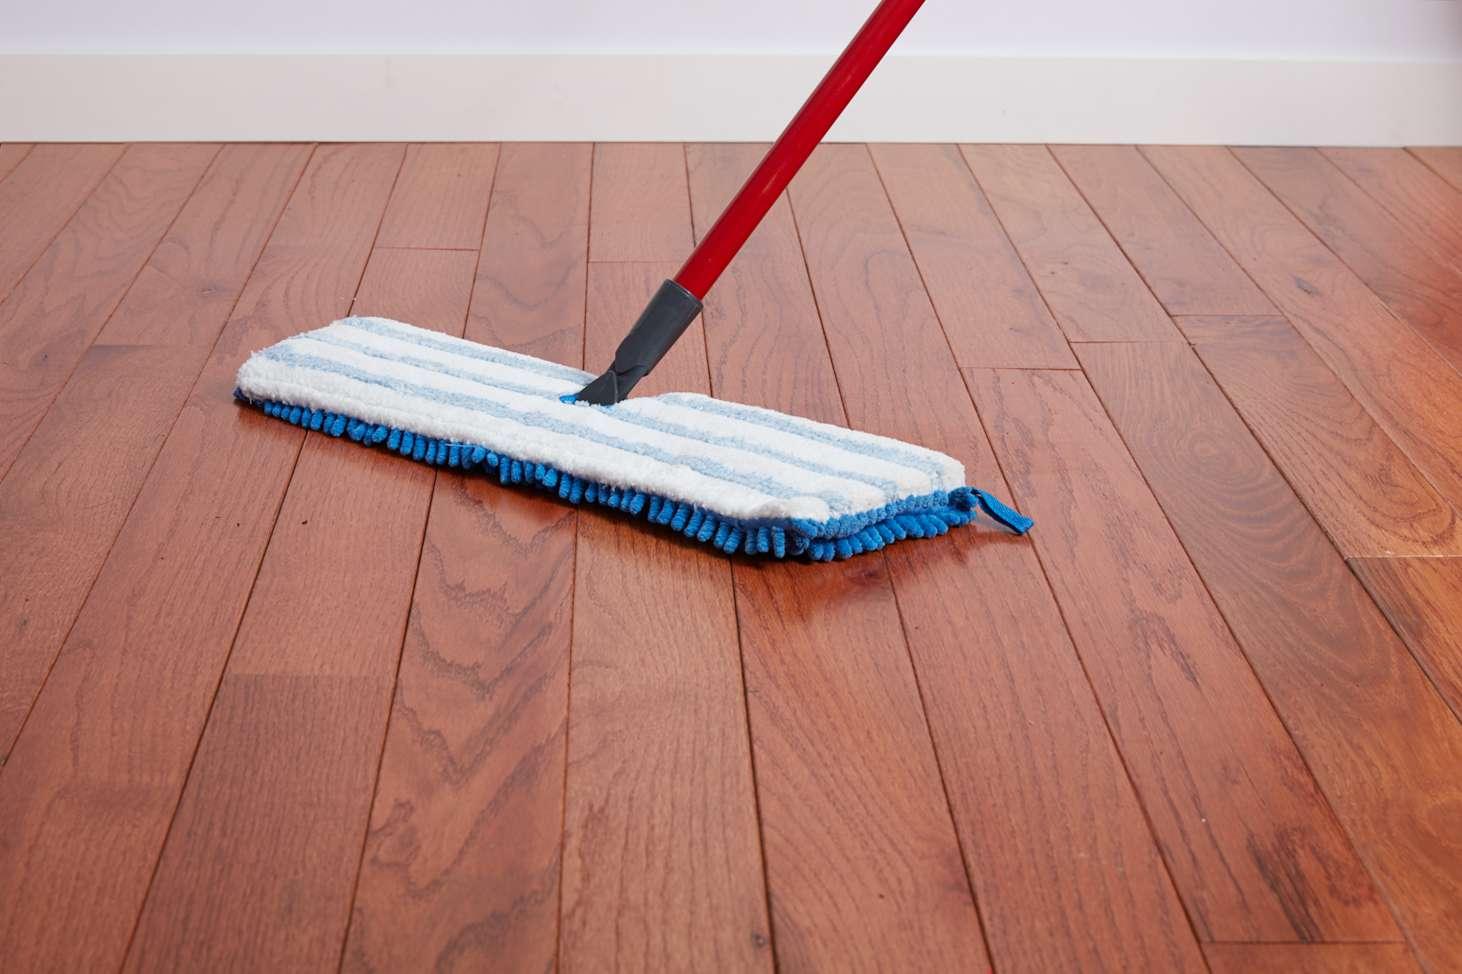 Microfiber mop on hardwood floor